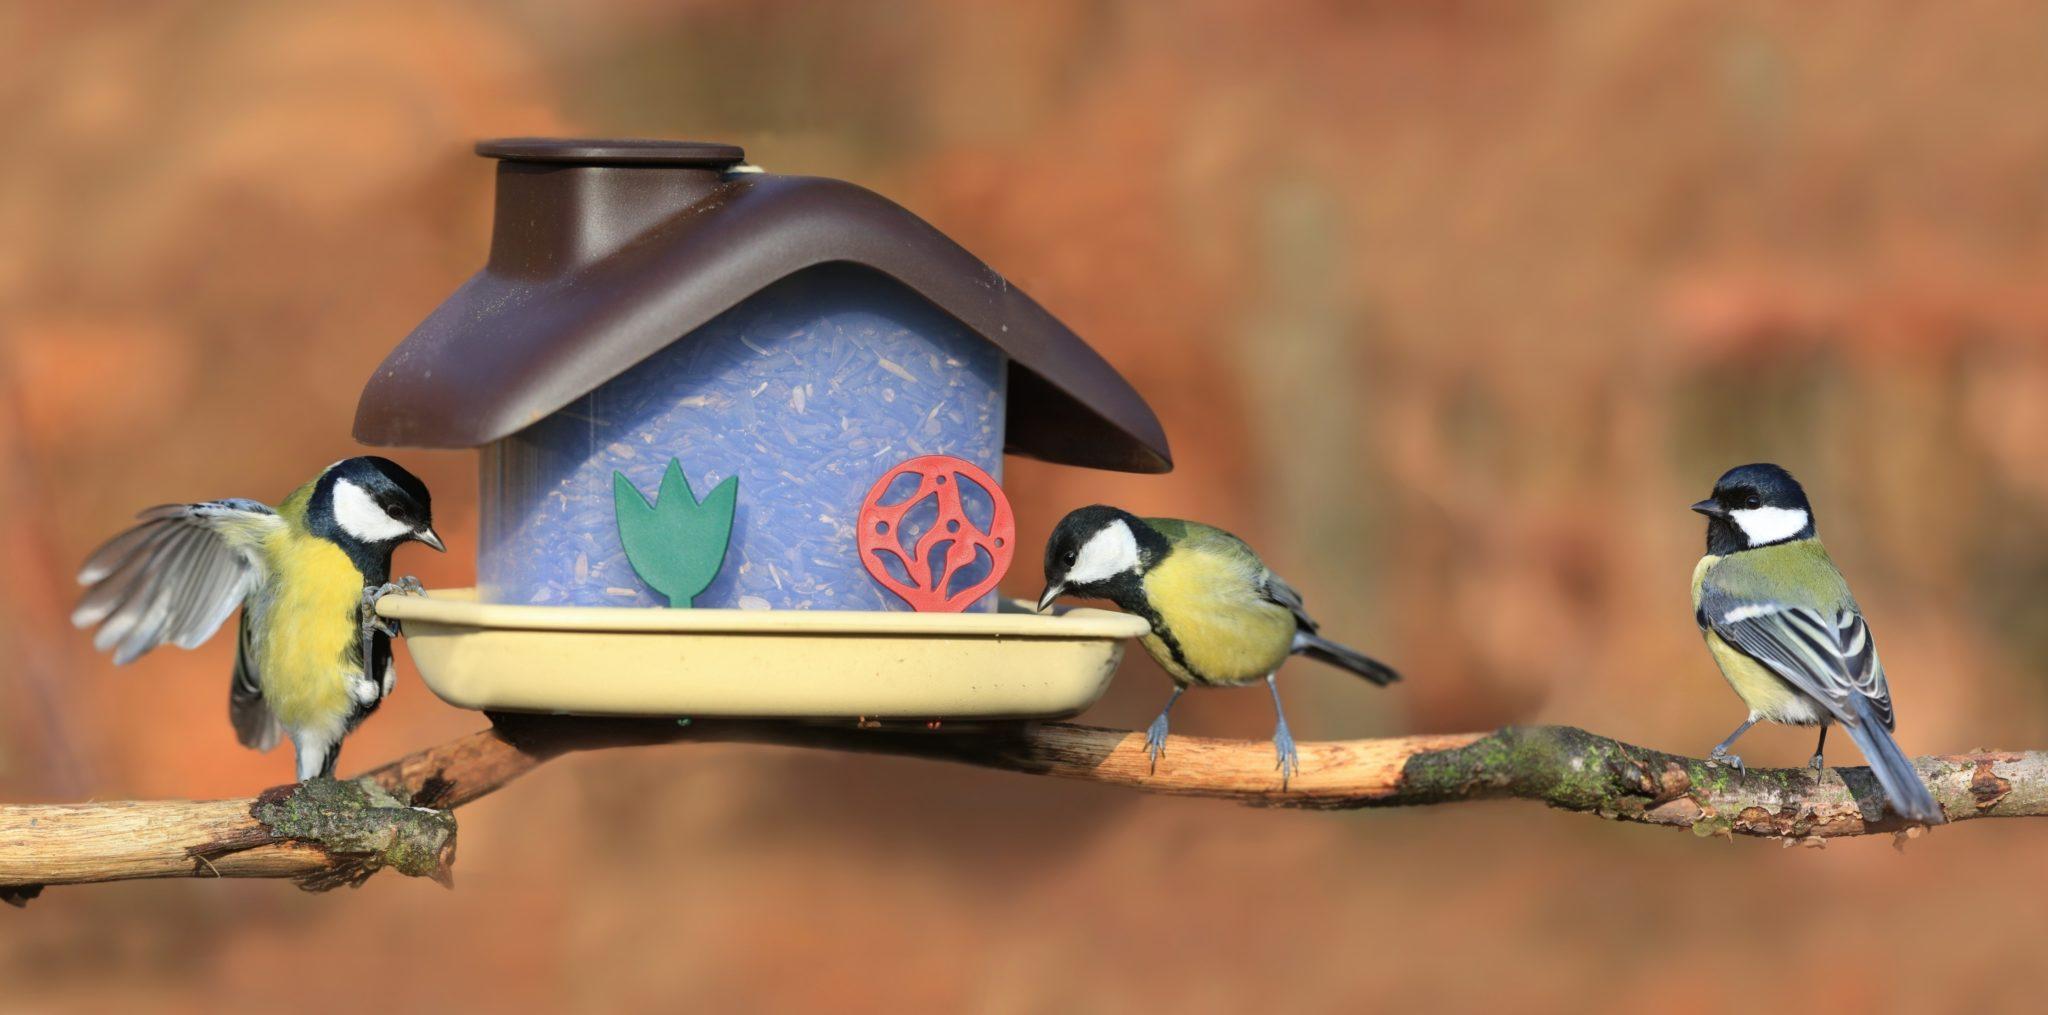 Videa z obrovských ptáků zdarma